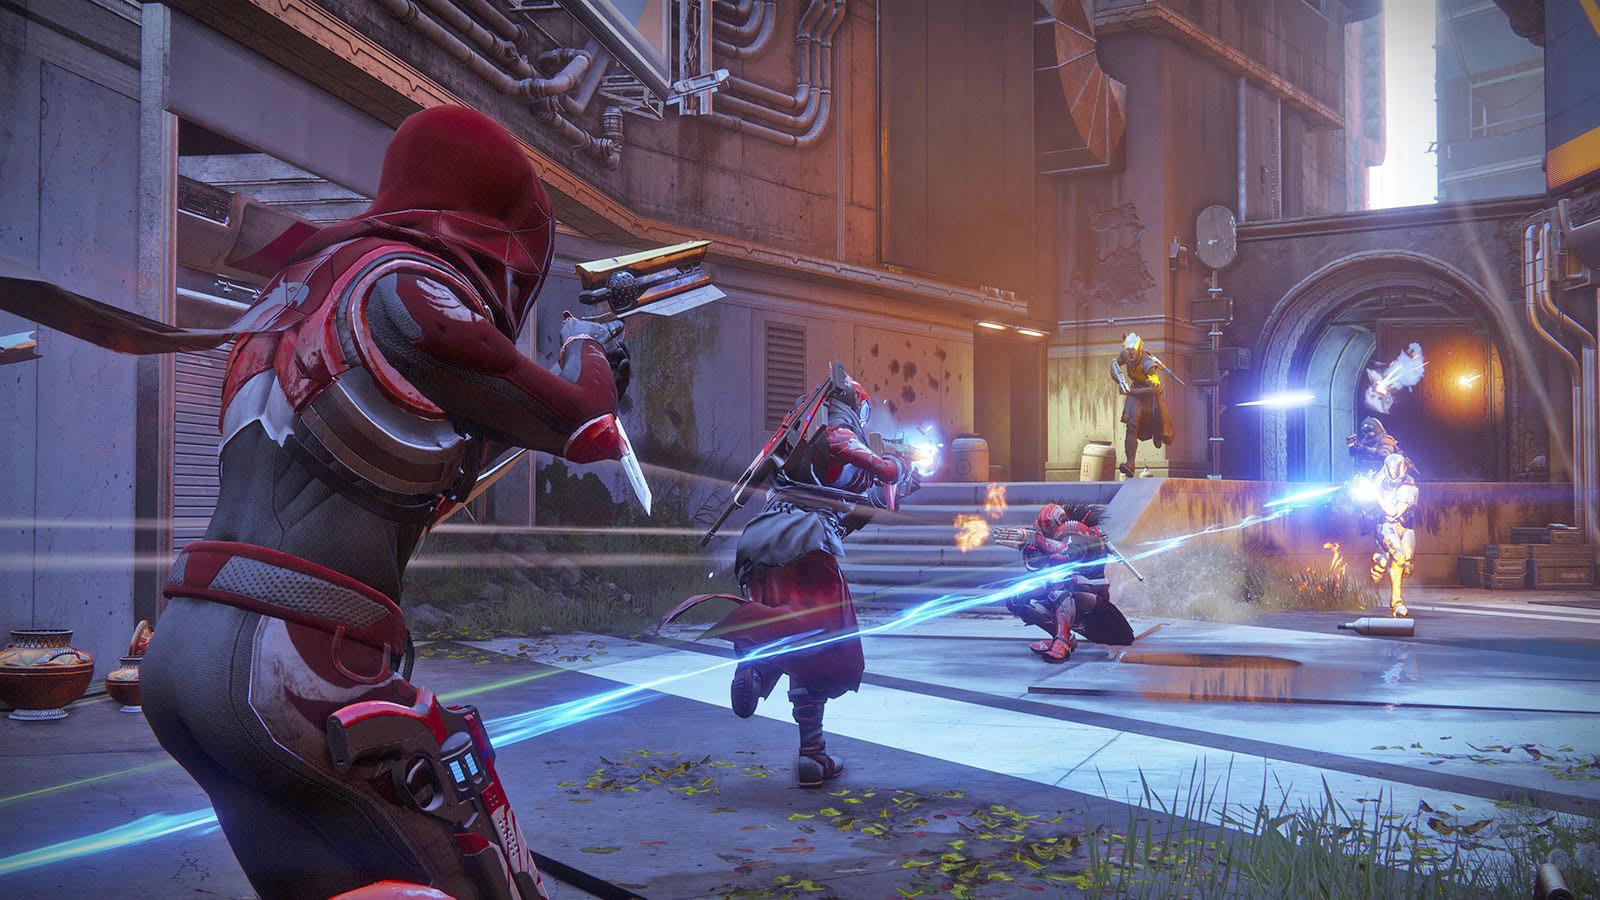 Destiny 2' studio will remove armor that looks like a 'hate